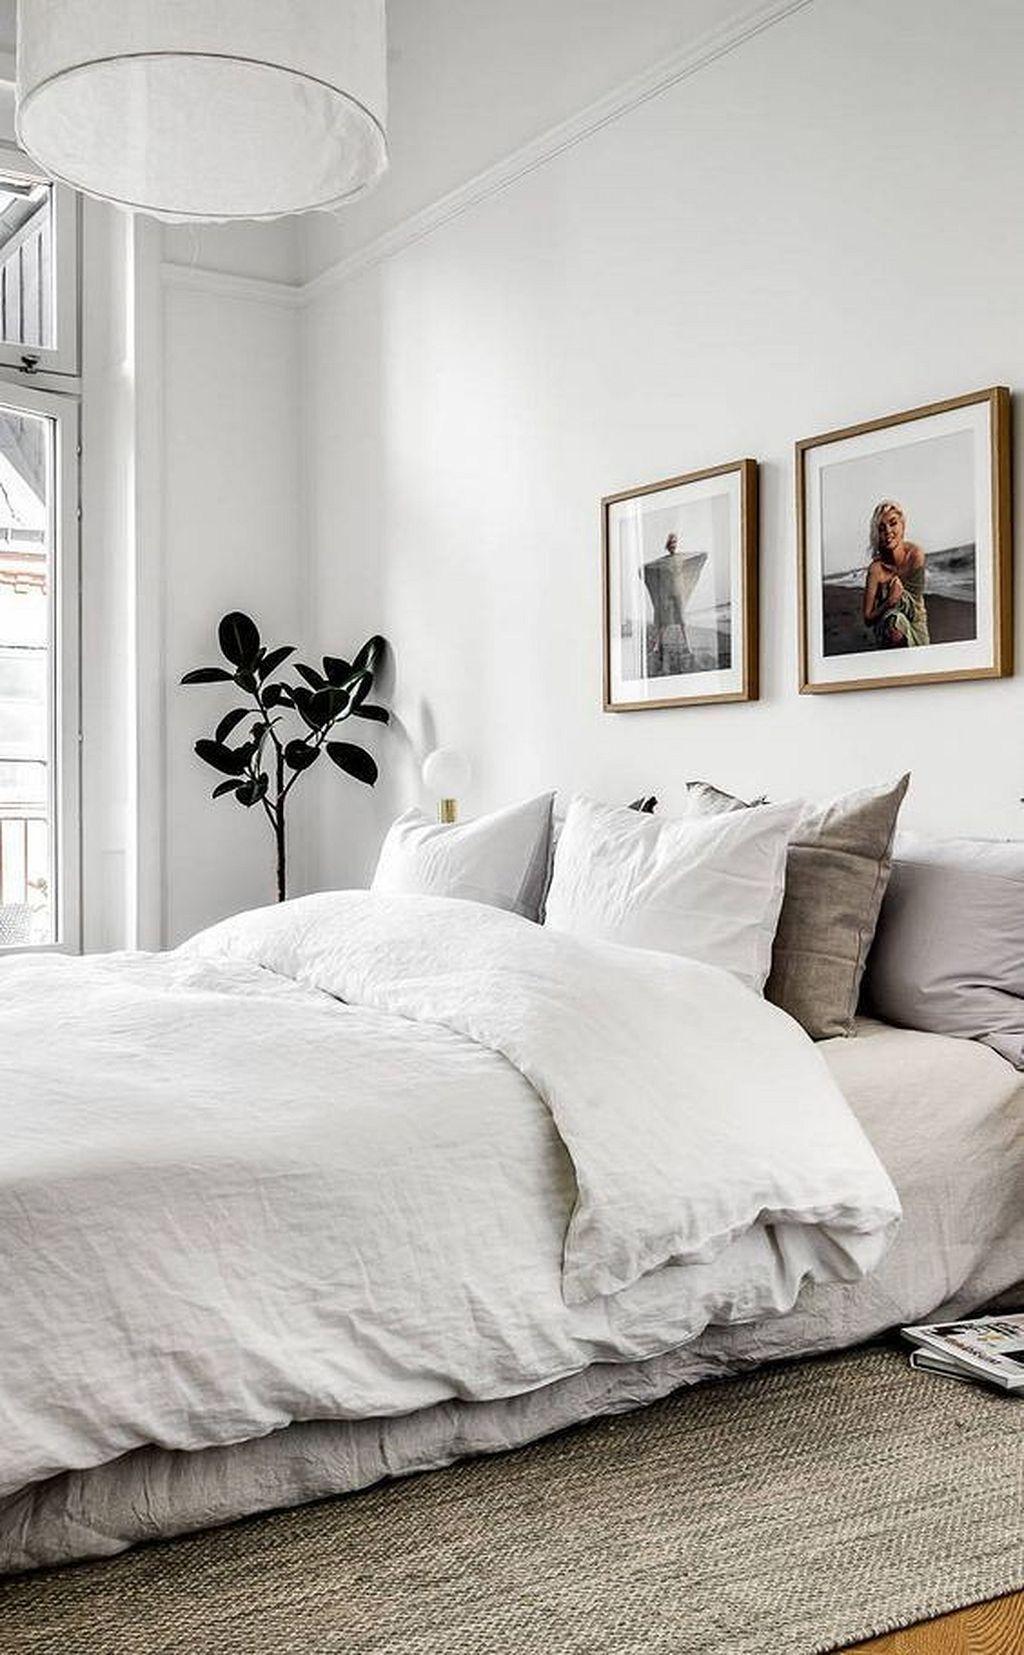 40 Cozy Small Bedroom Ideas Bedroom Inspirations Bedroom Interior Bedroom Design